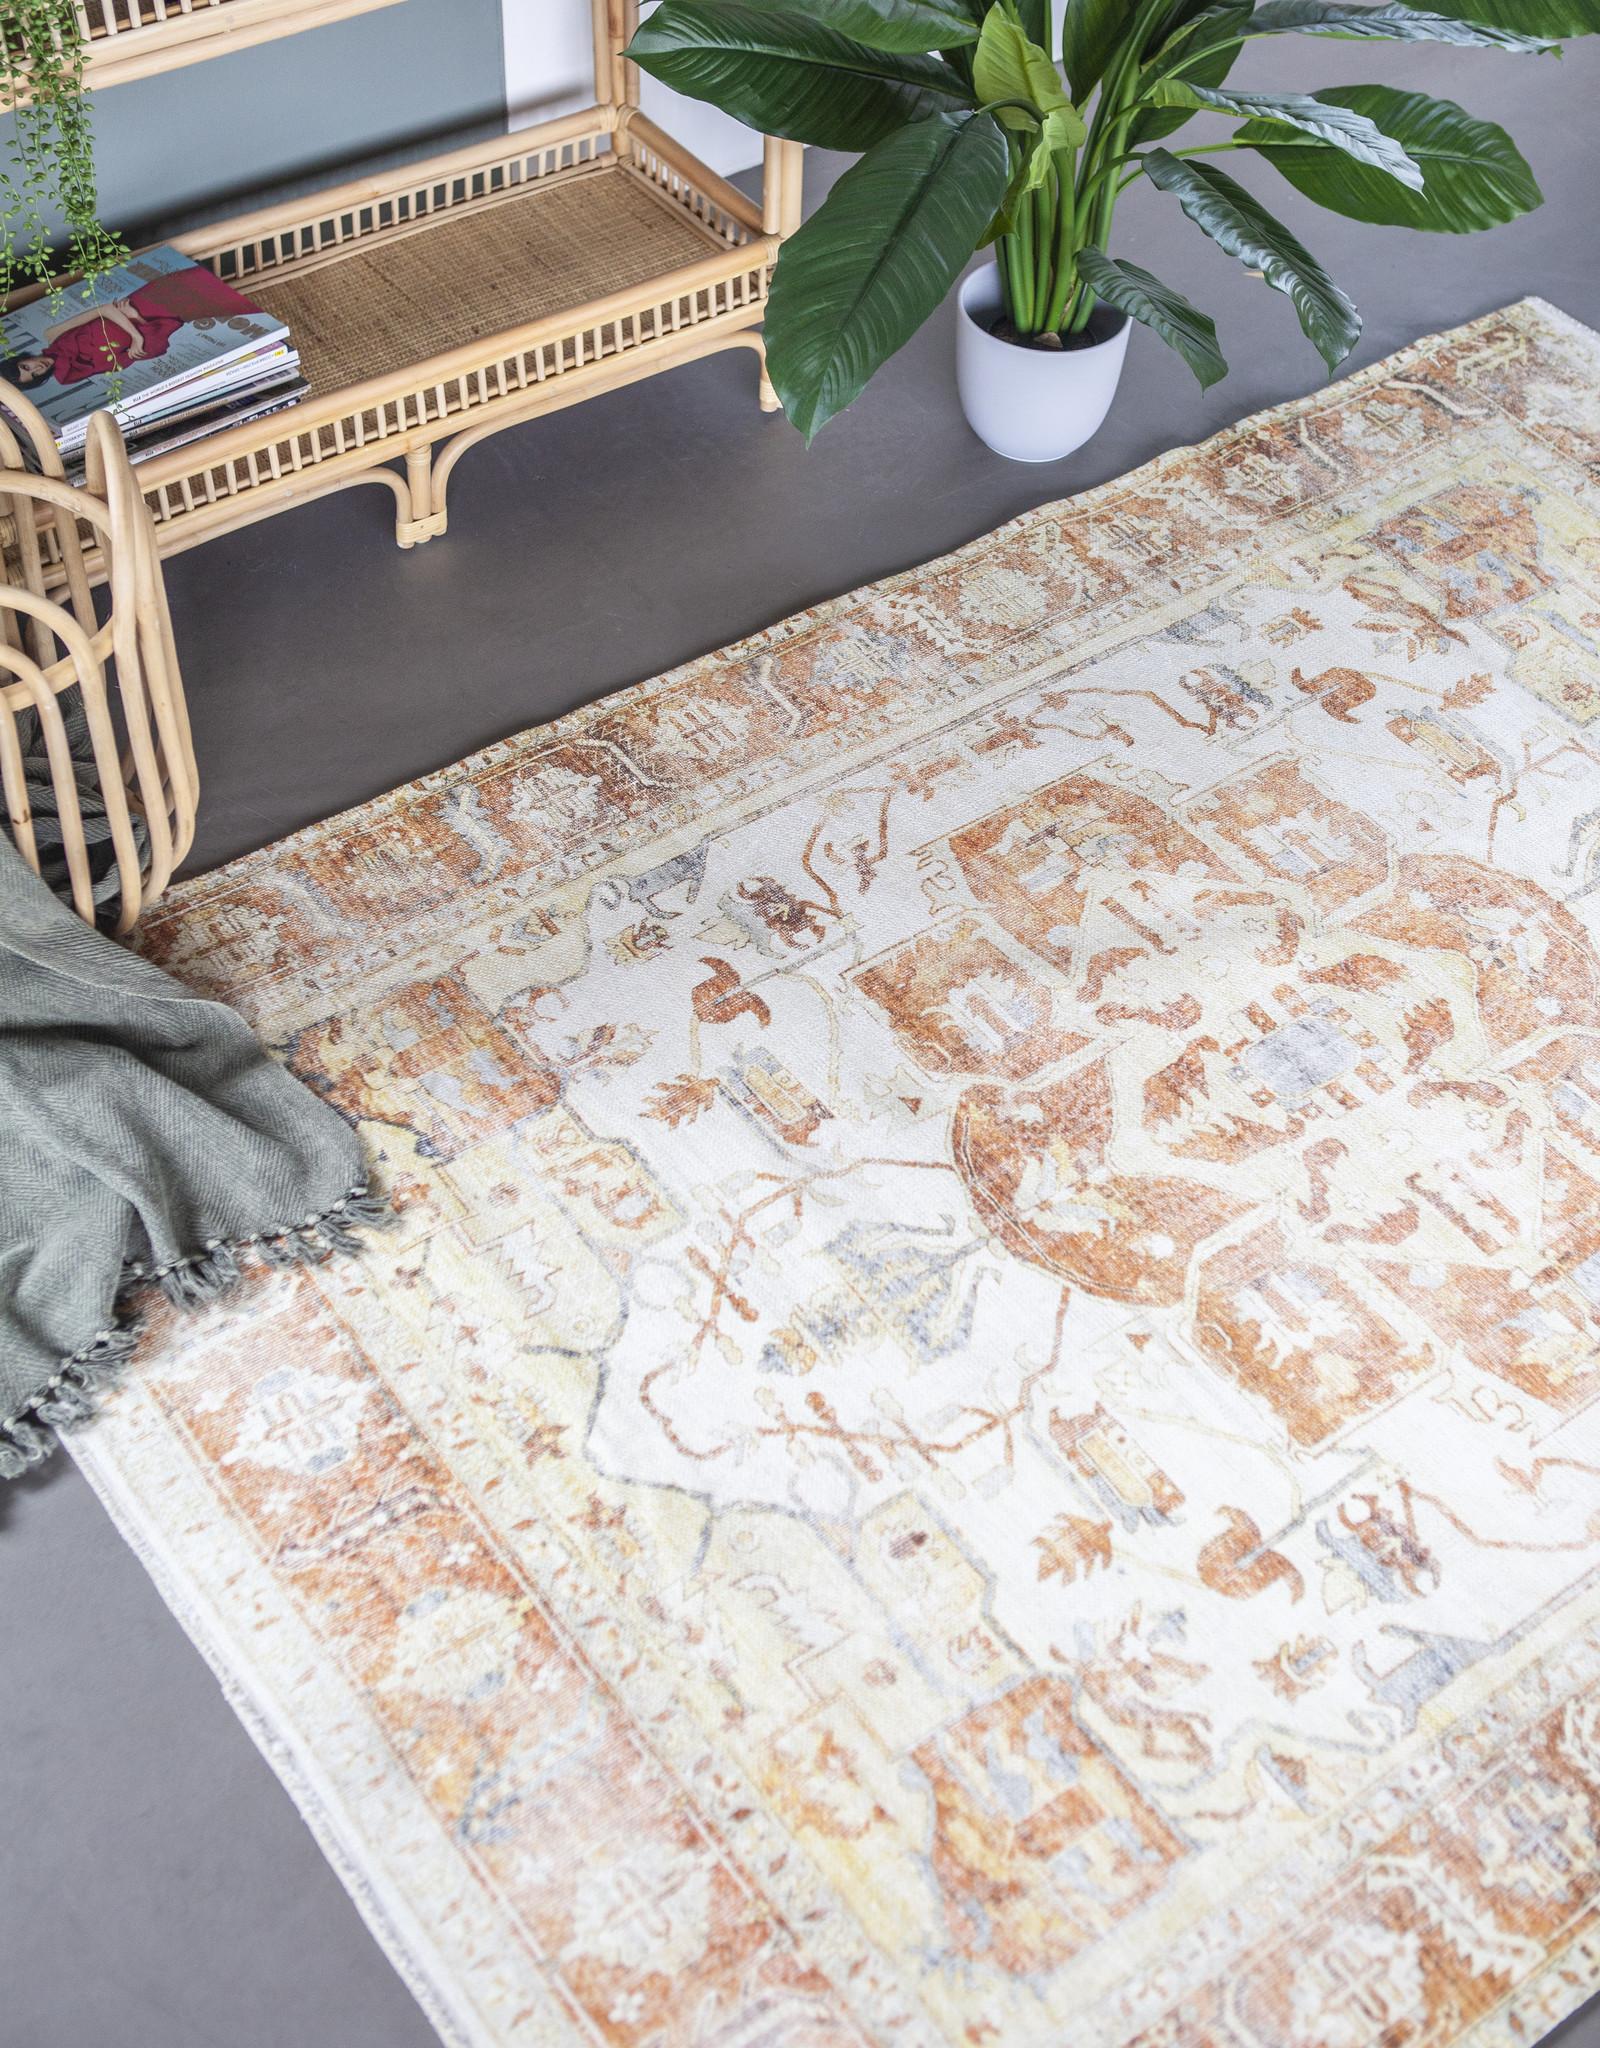 Vloerkleed Alex 160 x 230 cm - oranje